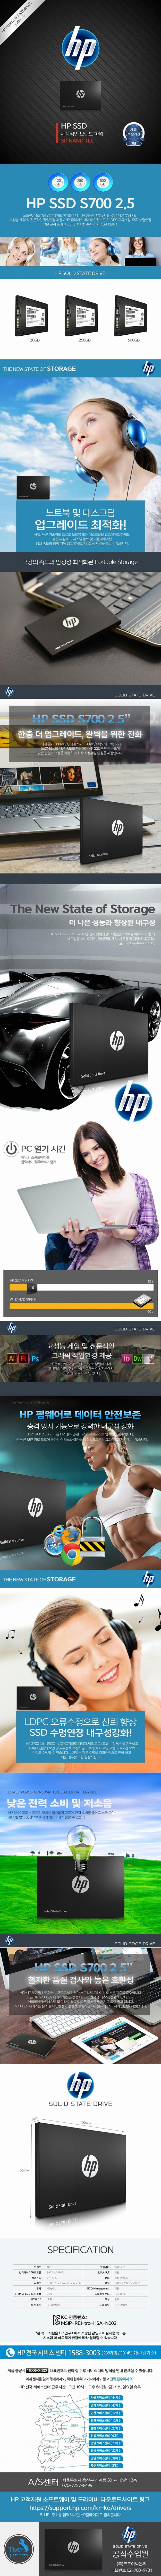 [HP] S700 (500GB)